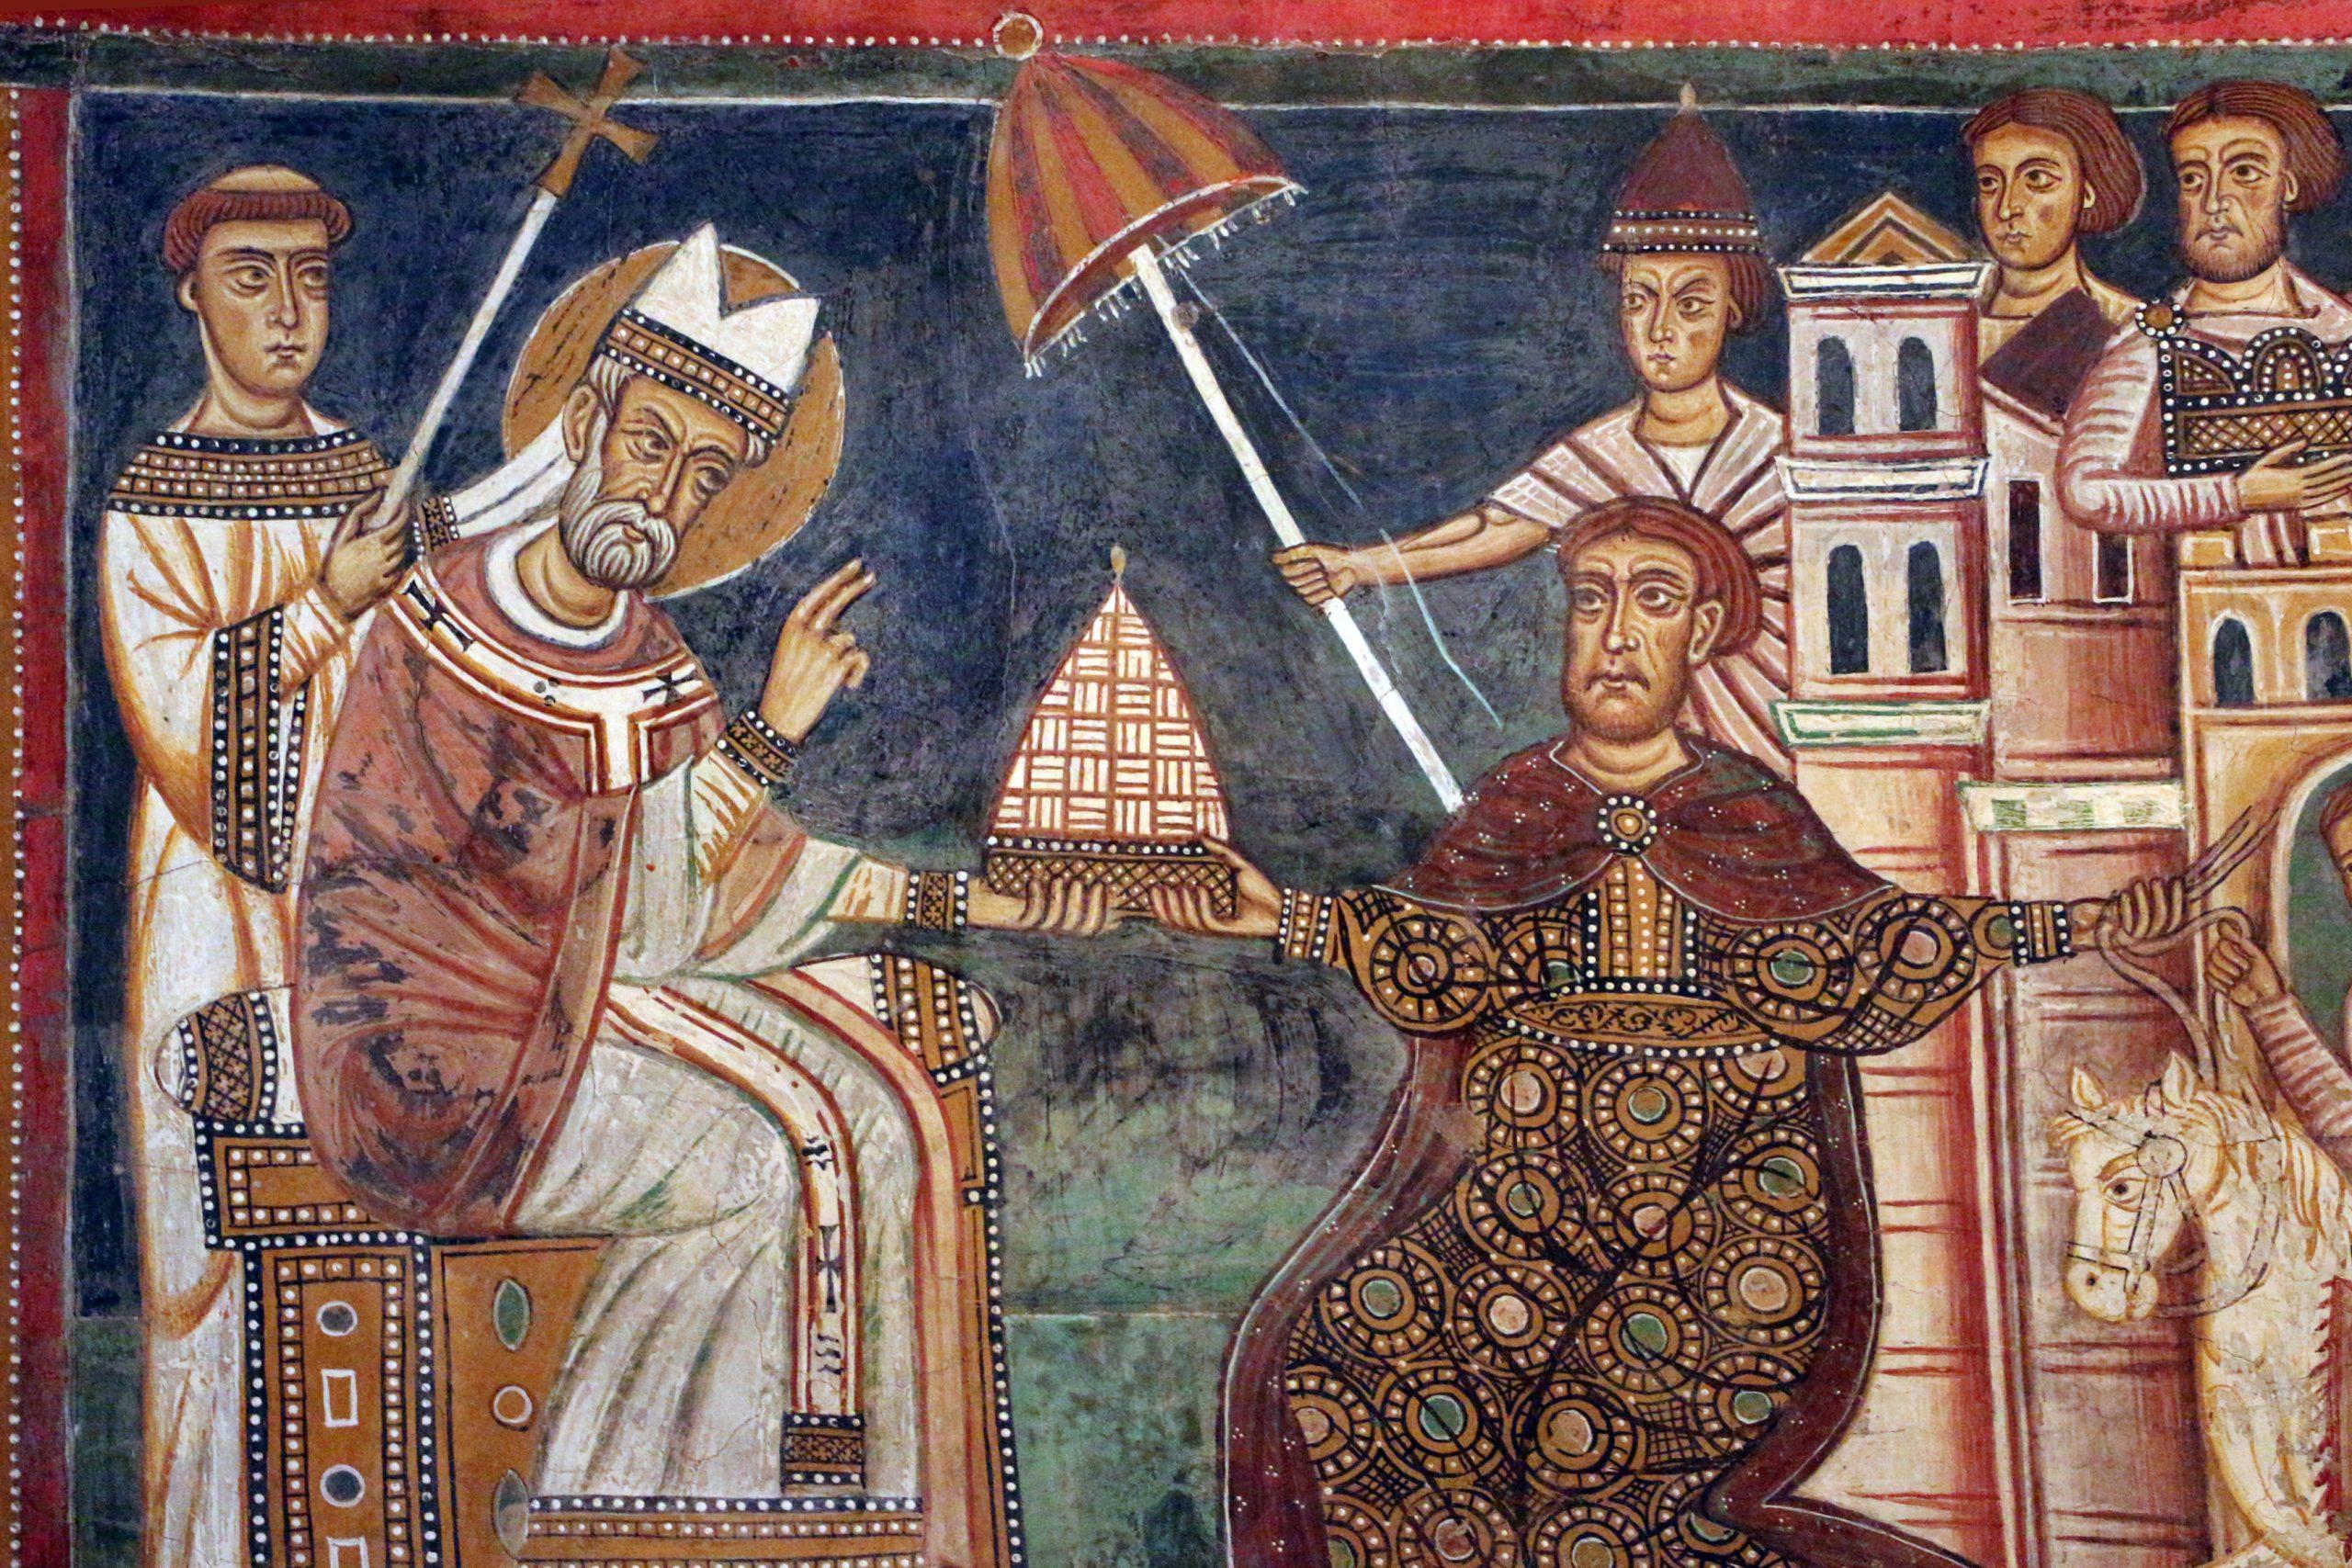 Medieval art in Sylvester Chapel at Santi Quattro Coronati near San Clemente